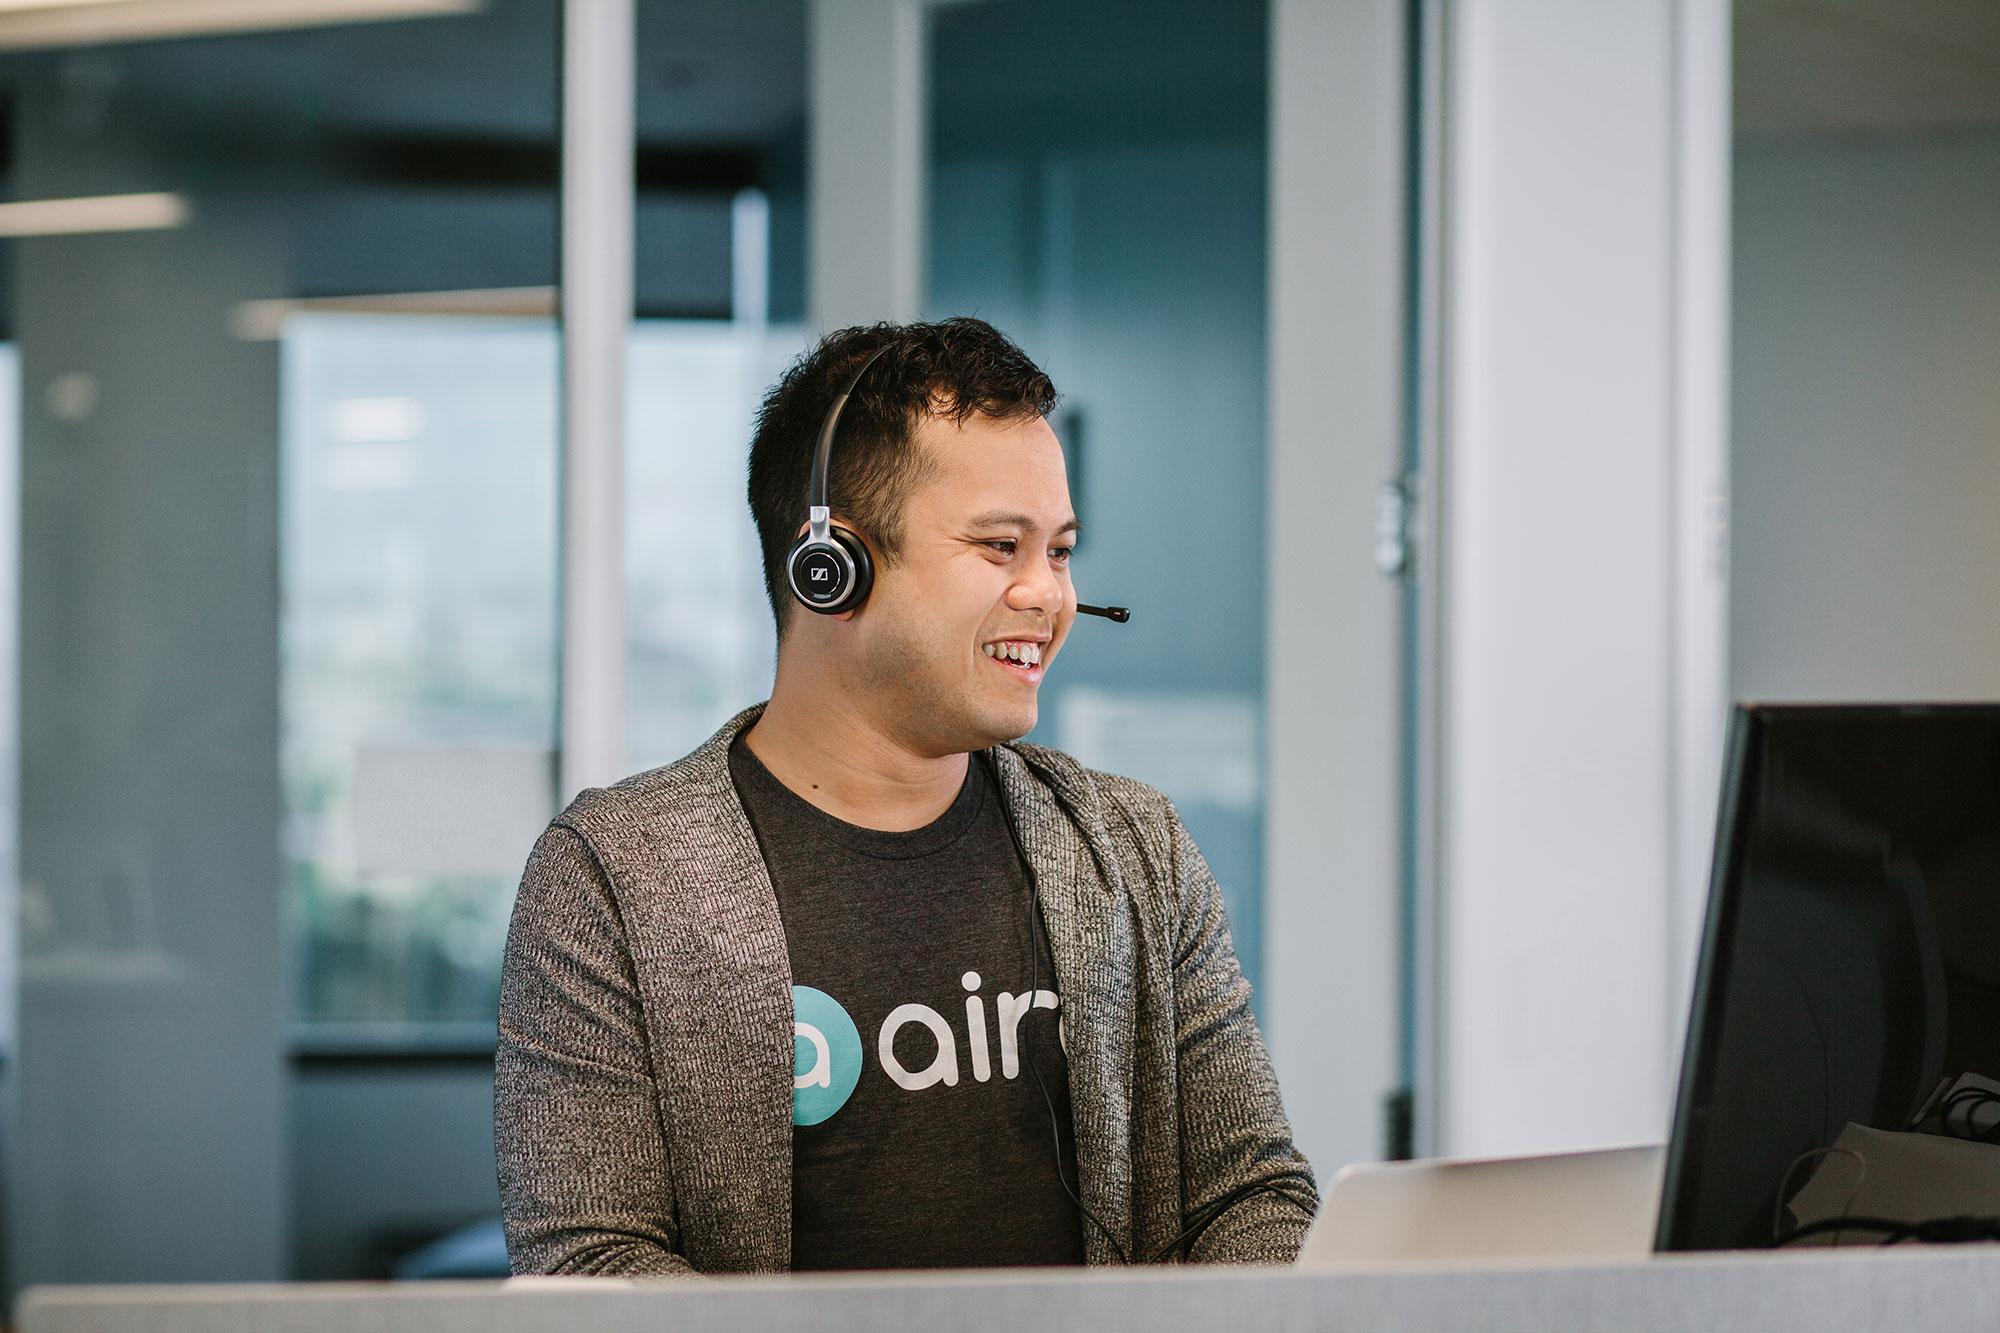 A Aira male person talking through headset